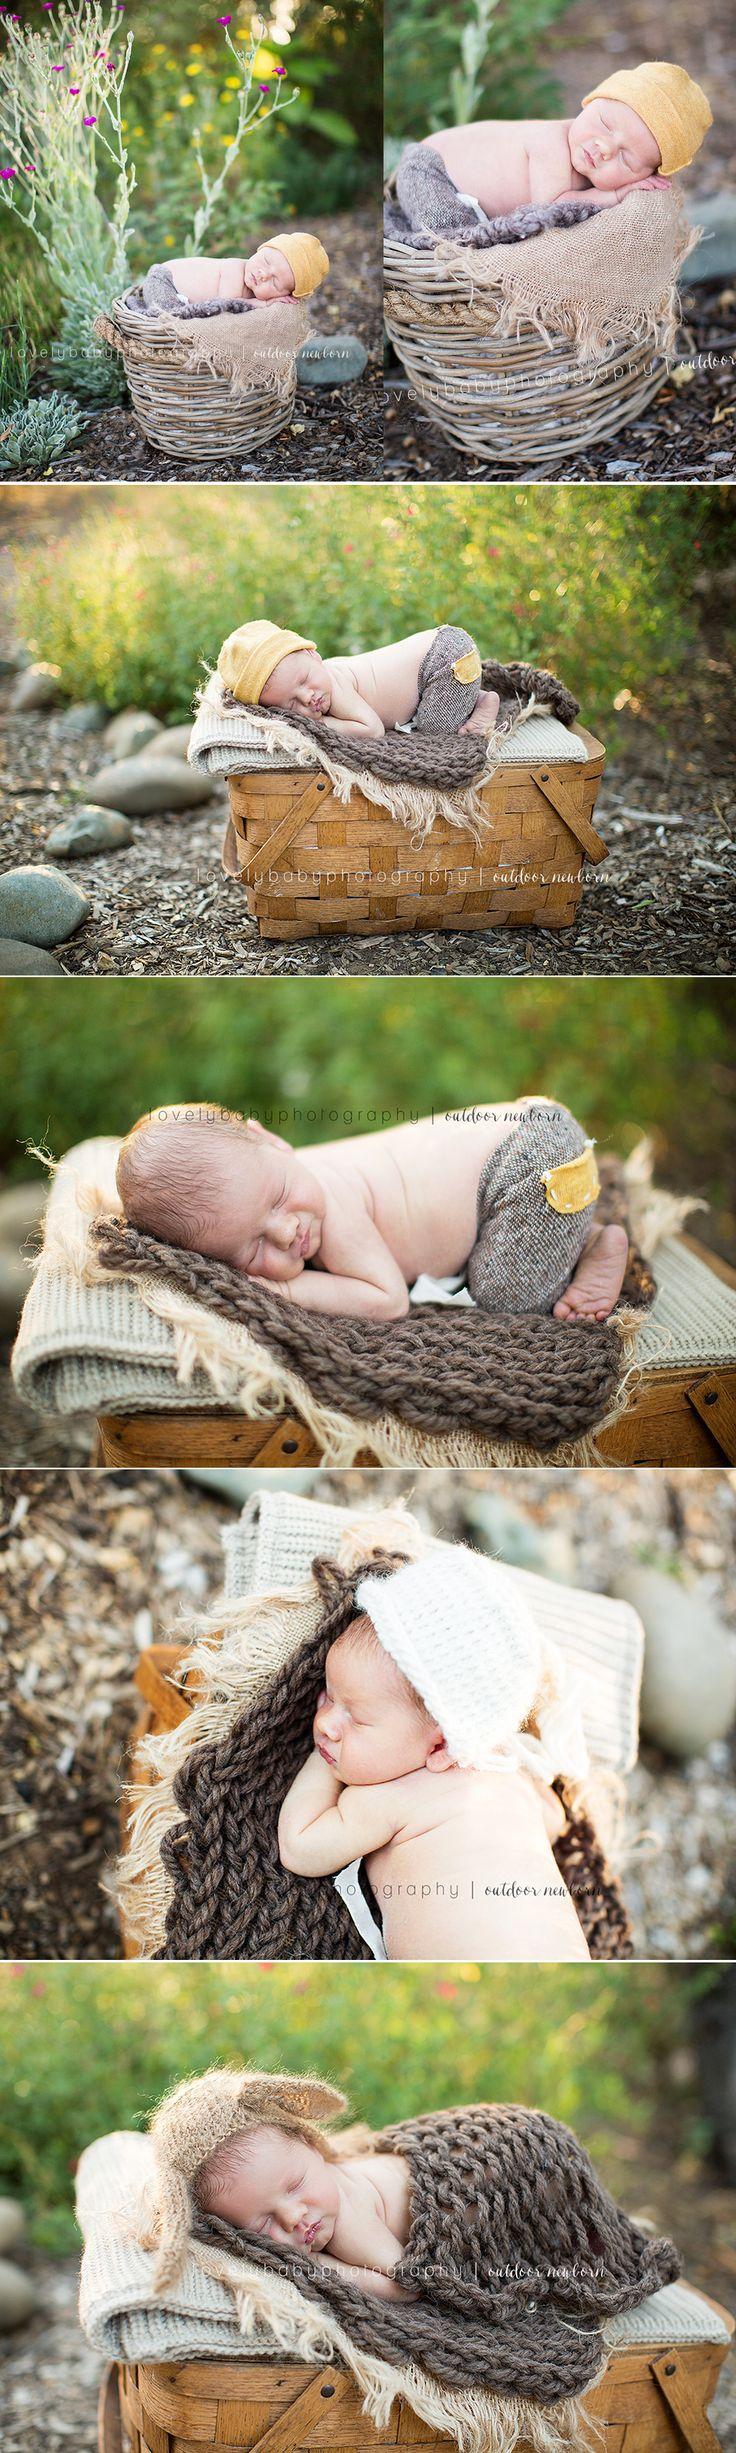 Outdoor Newborn Boy Session - Lovely Baby Photography Sacramento